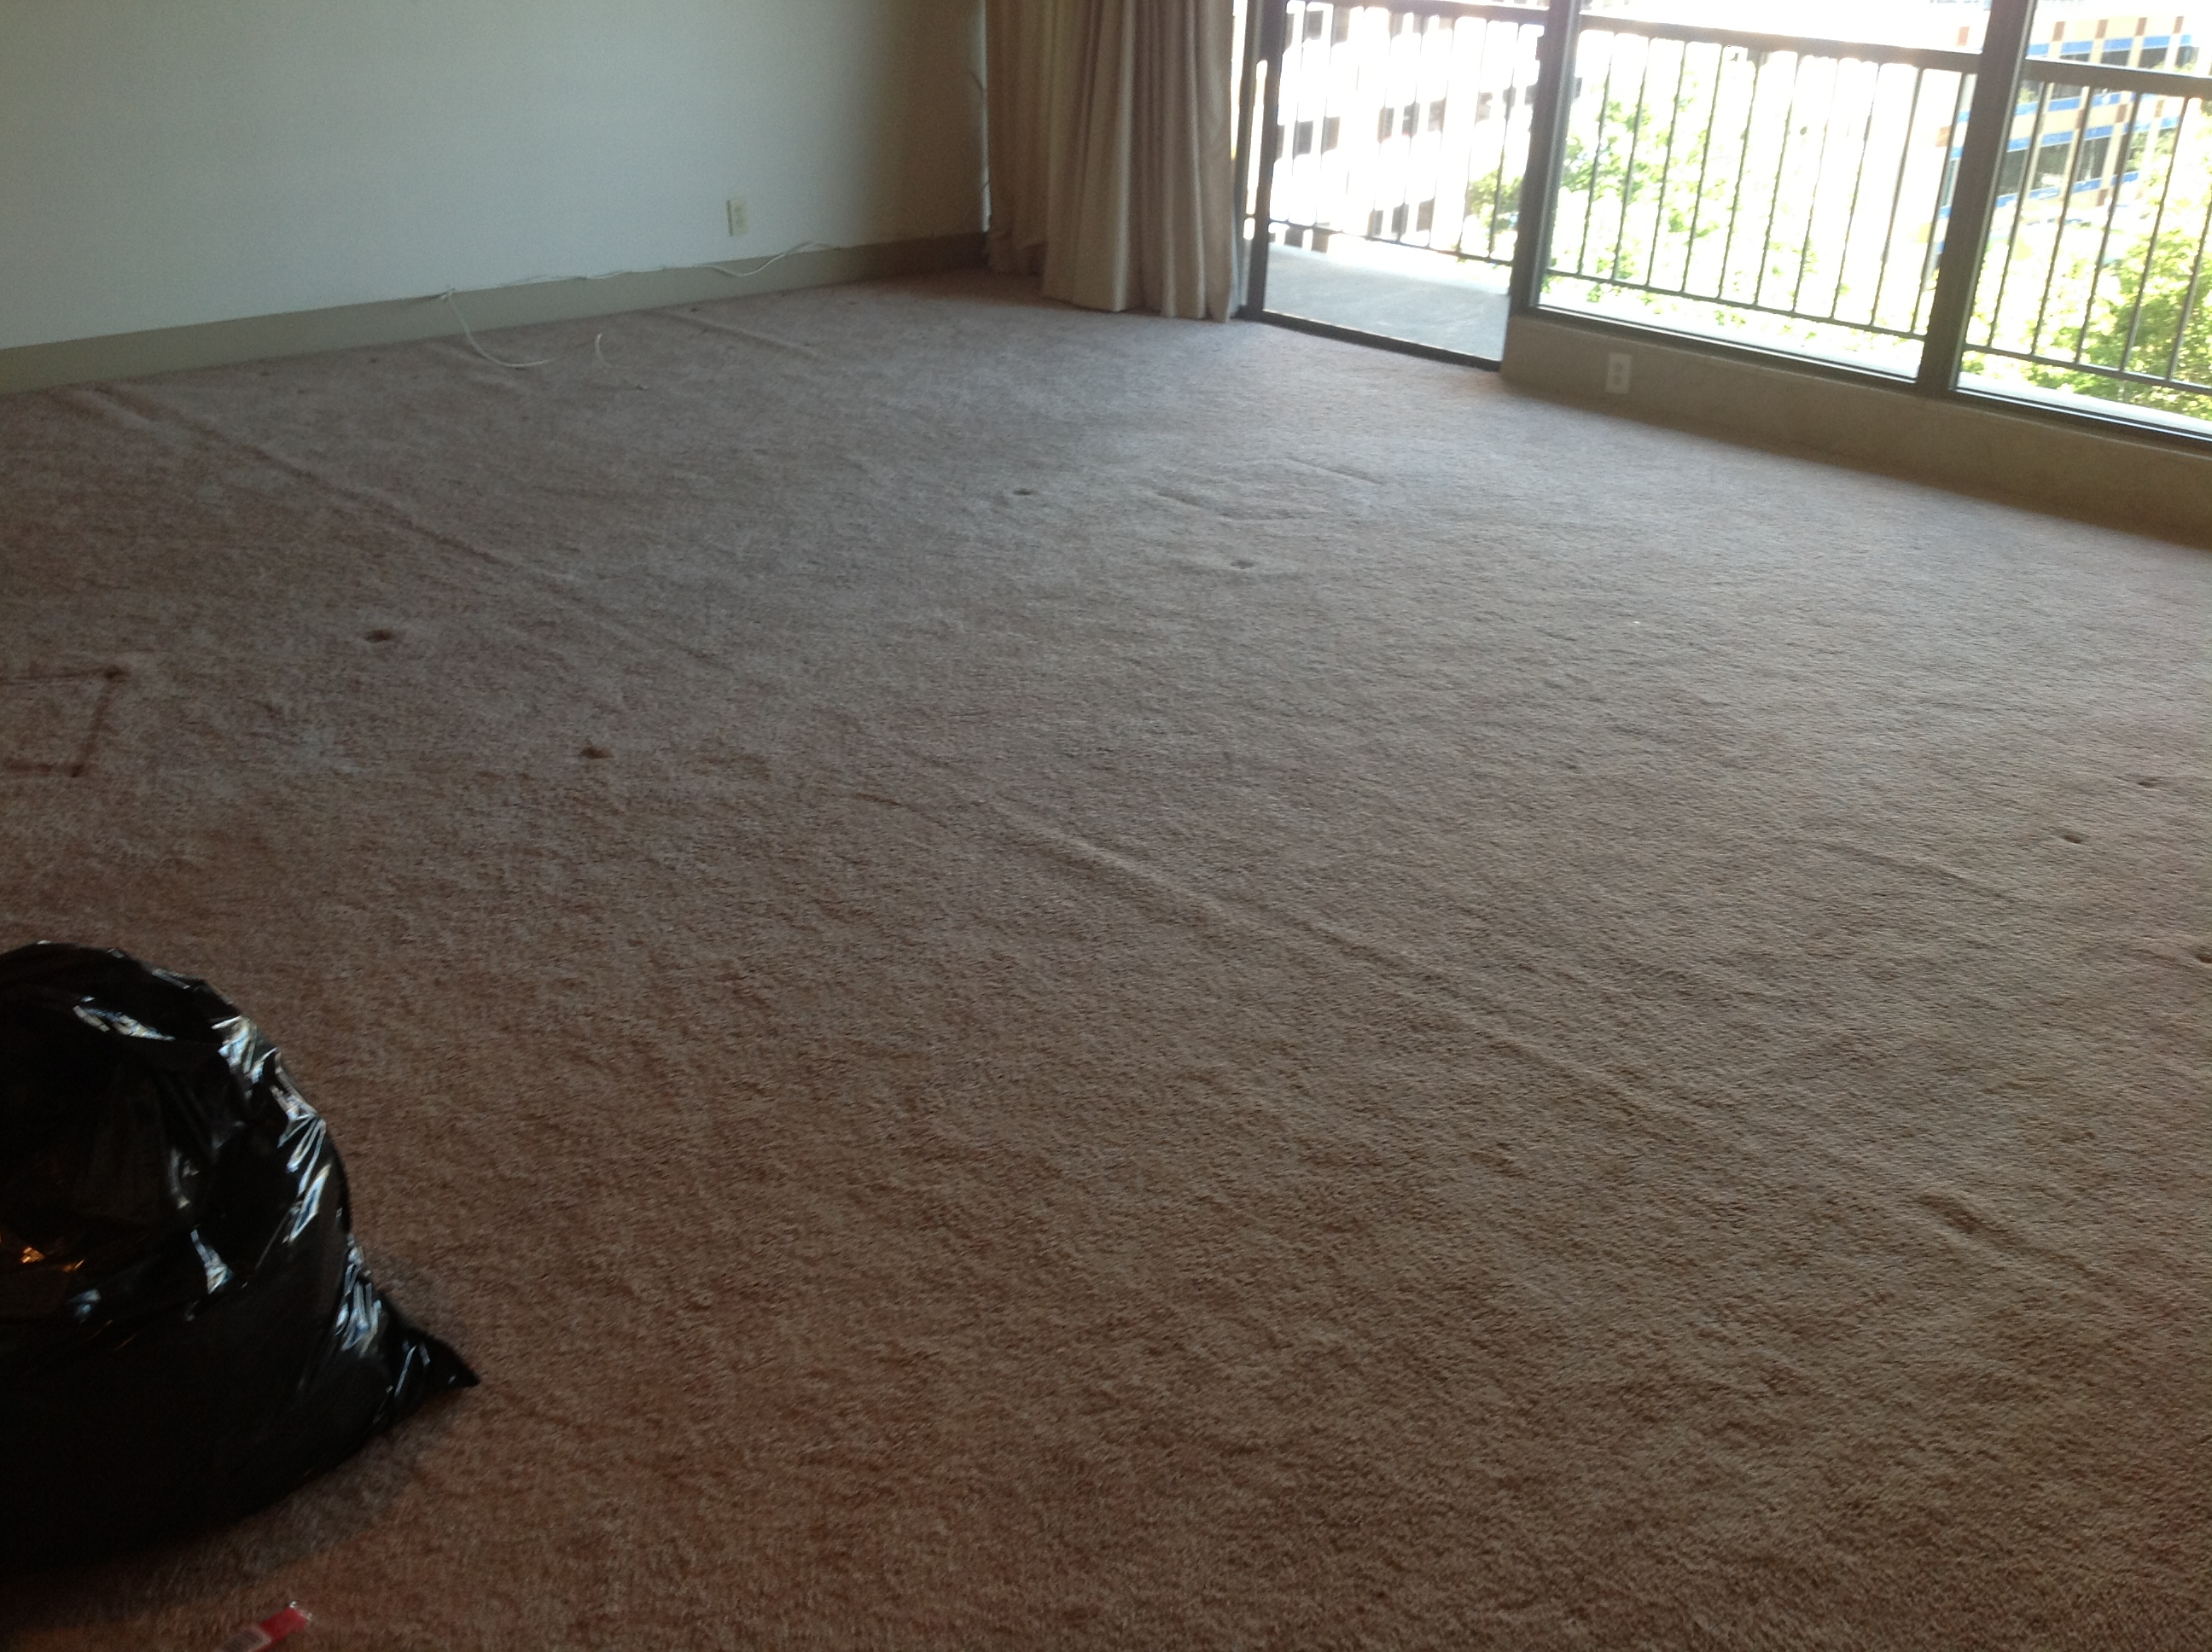 Porcelain Tile Carpet Glue Removal California Tile